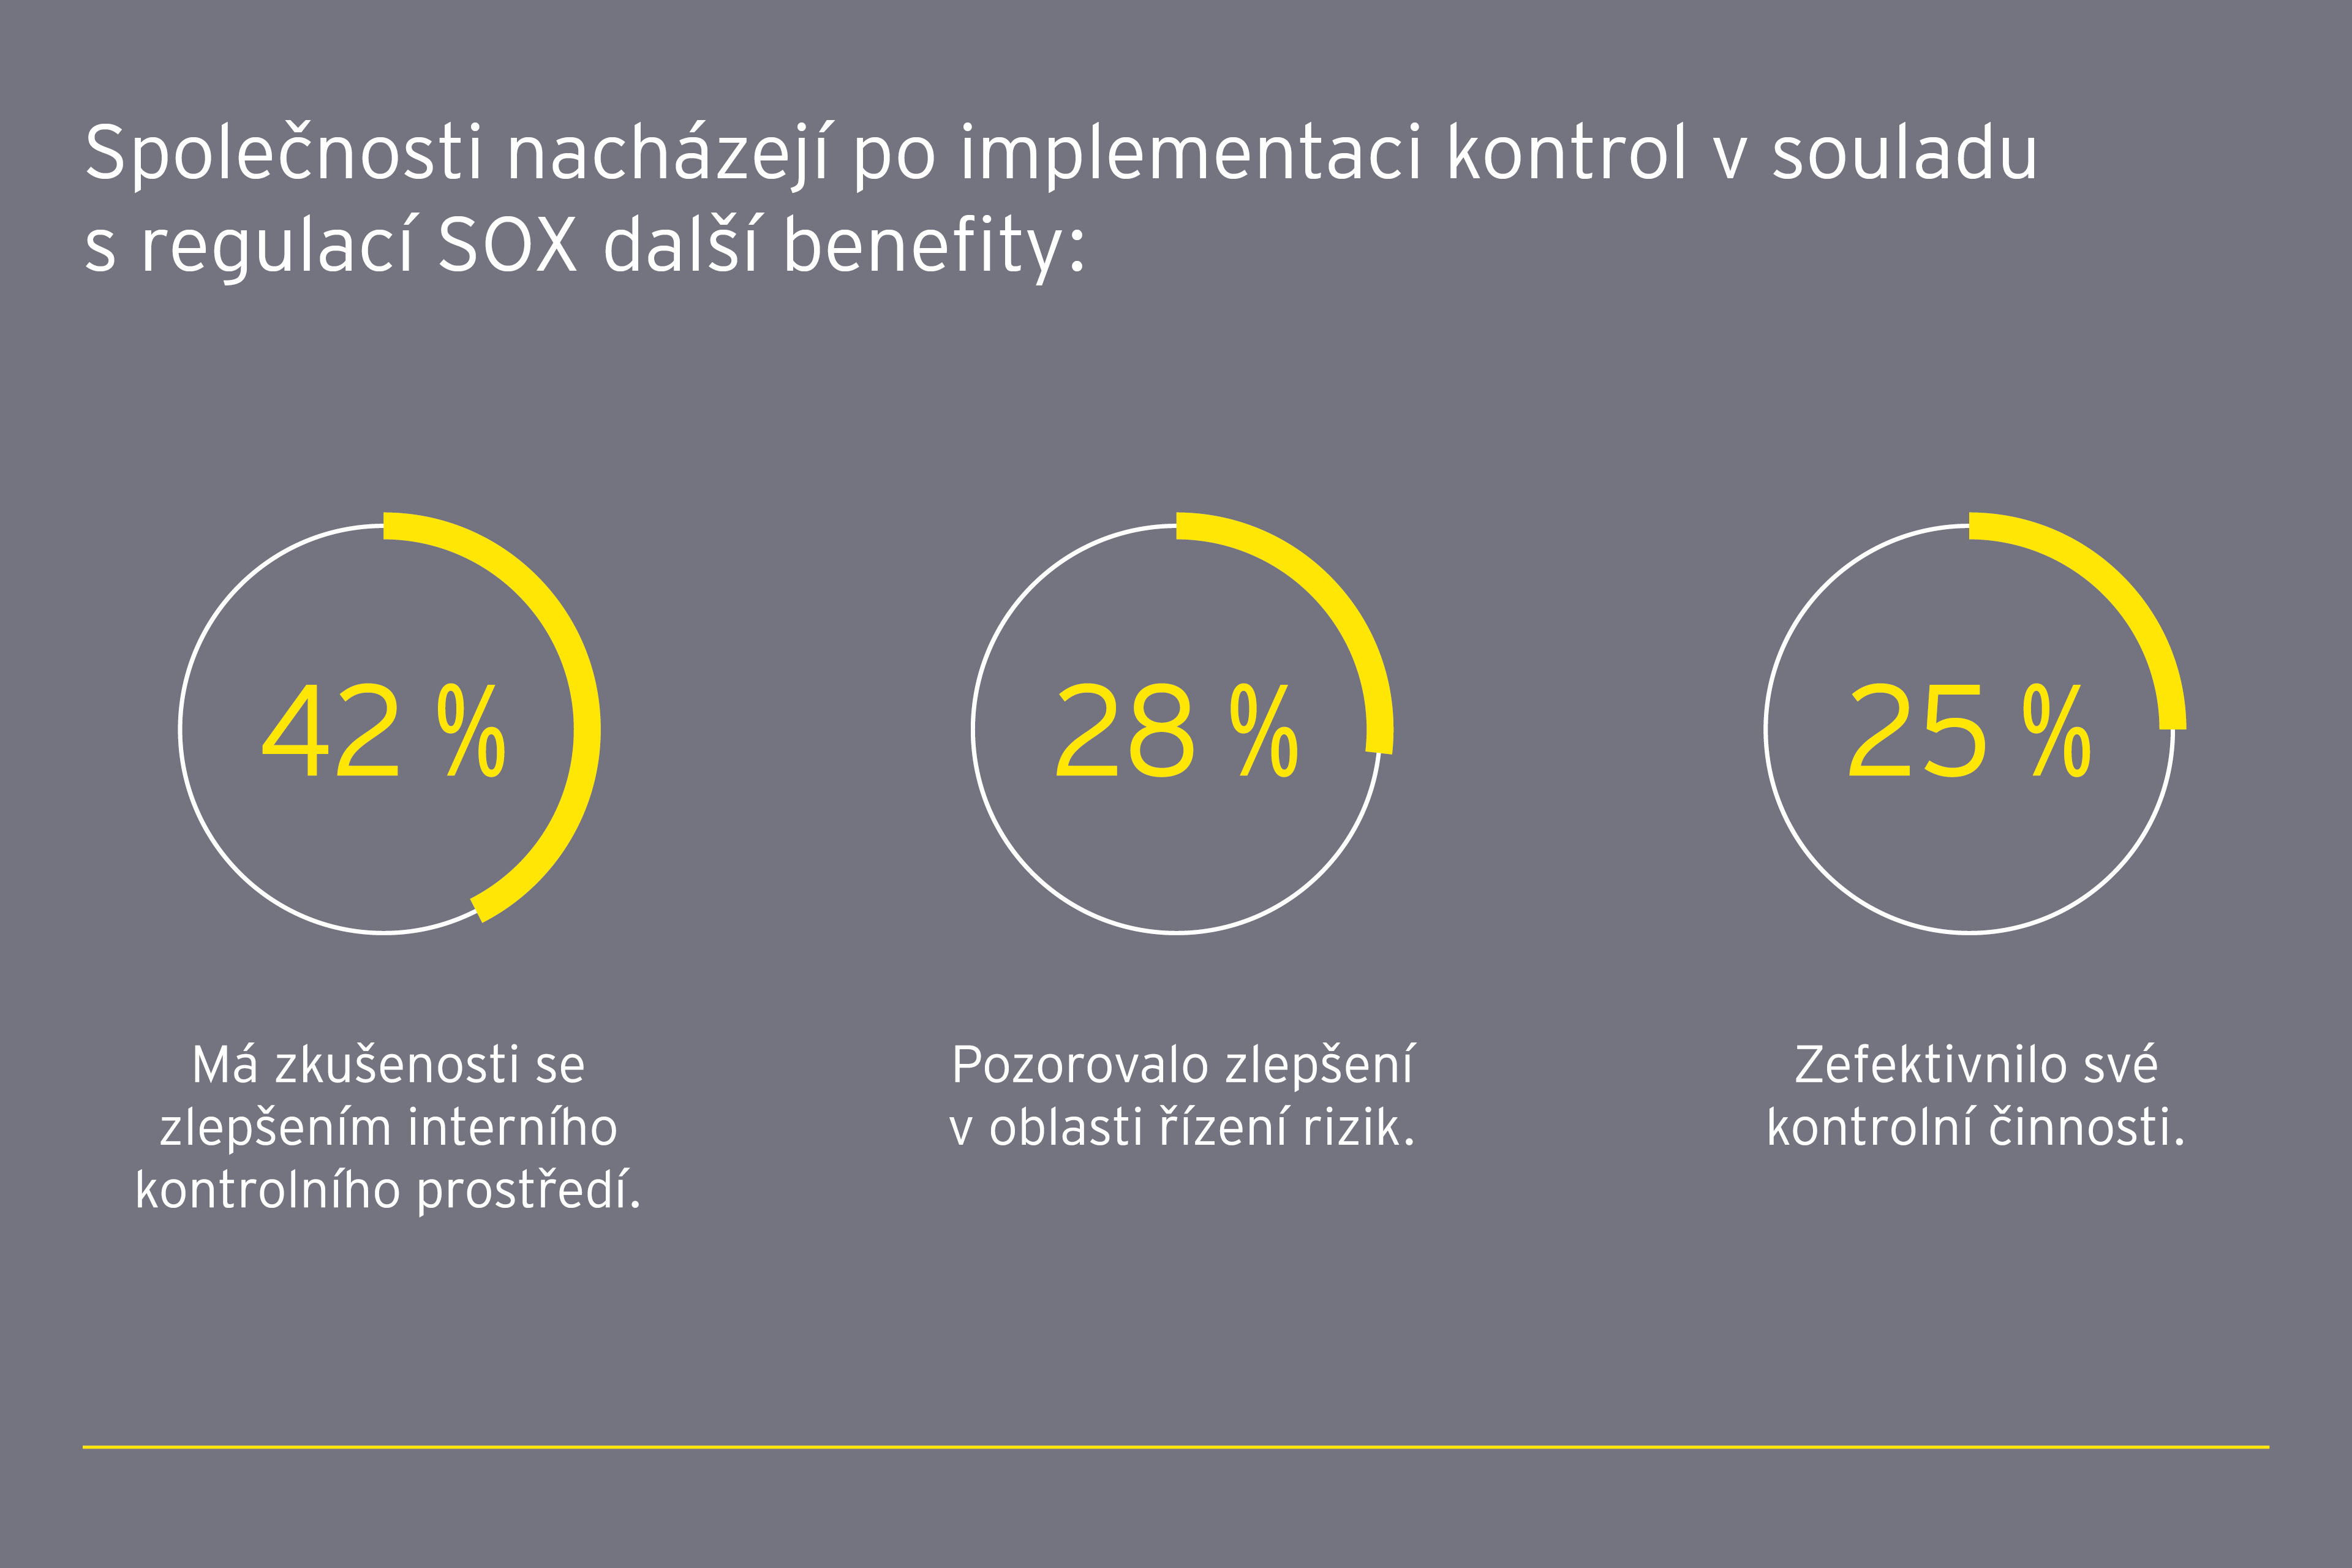 jak-posilit-interni-kontrolni-system-inspirujte-se-v-regulaci-sox graf 1